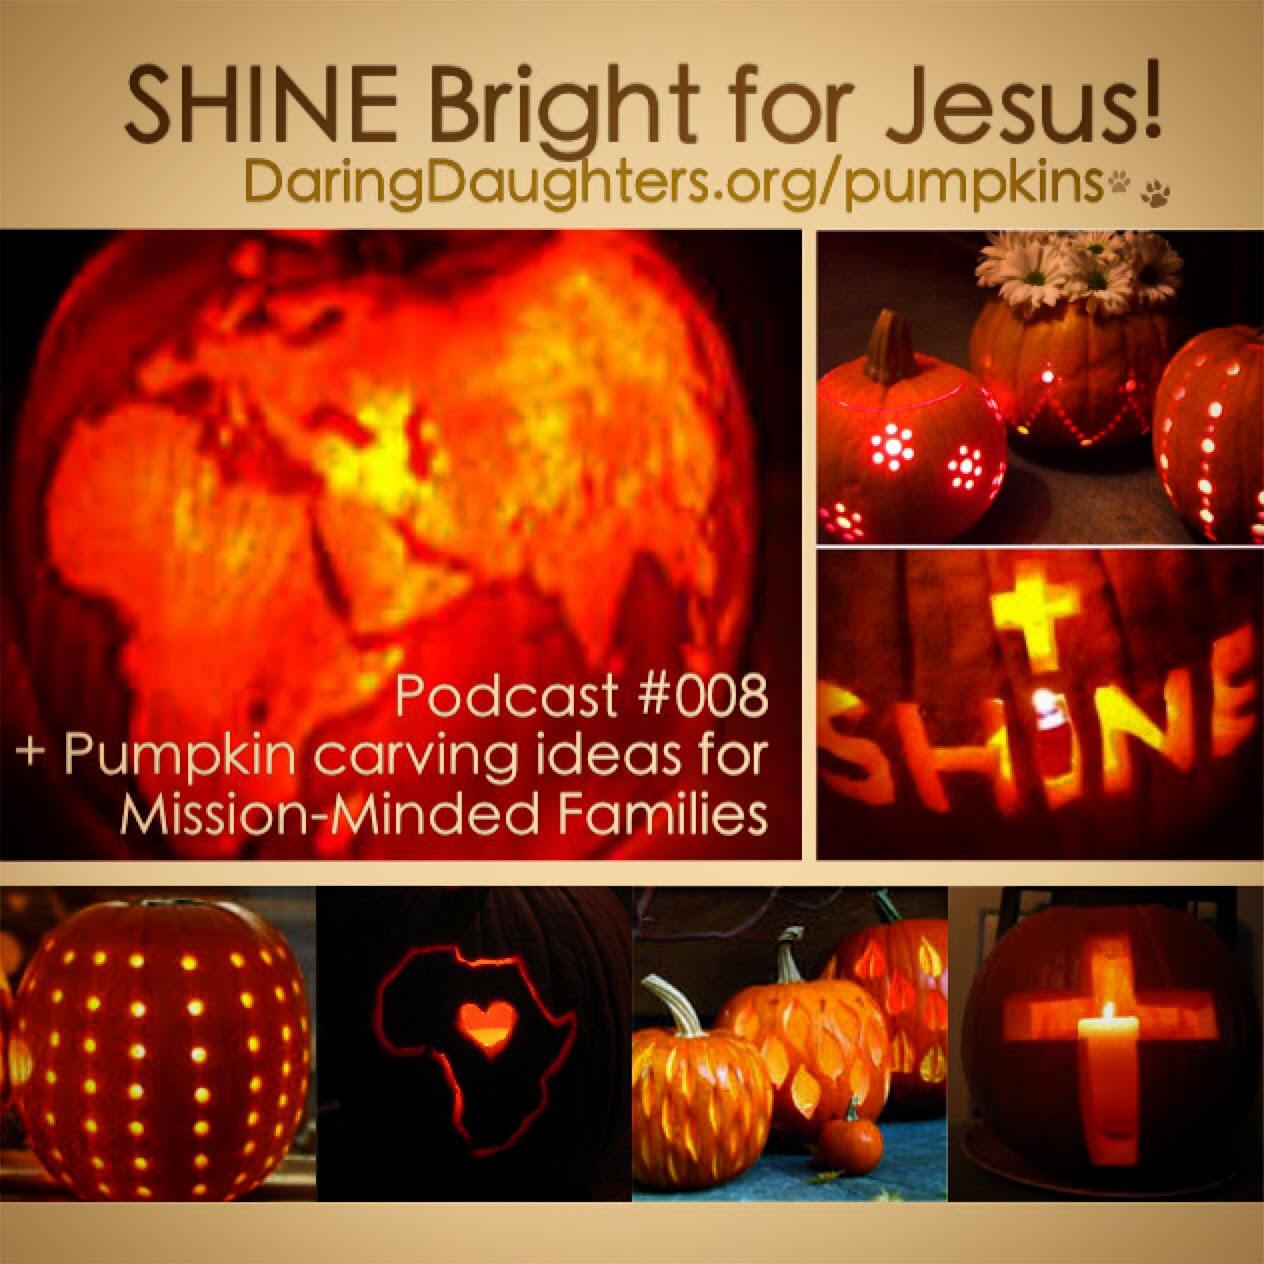 50 Pretty Pumpkin Carving Ideas: Christian, Cross, Faith, Missions ...